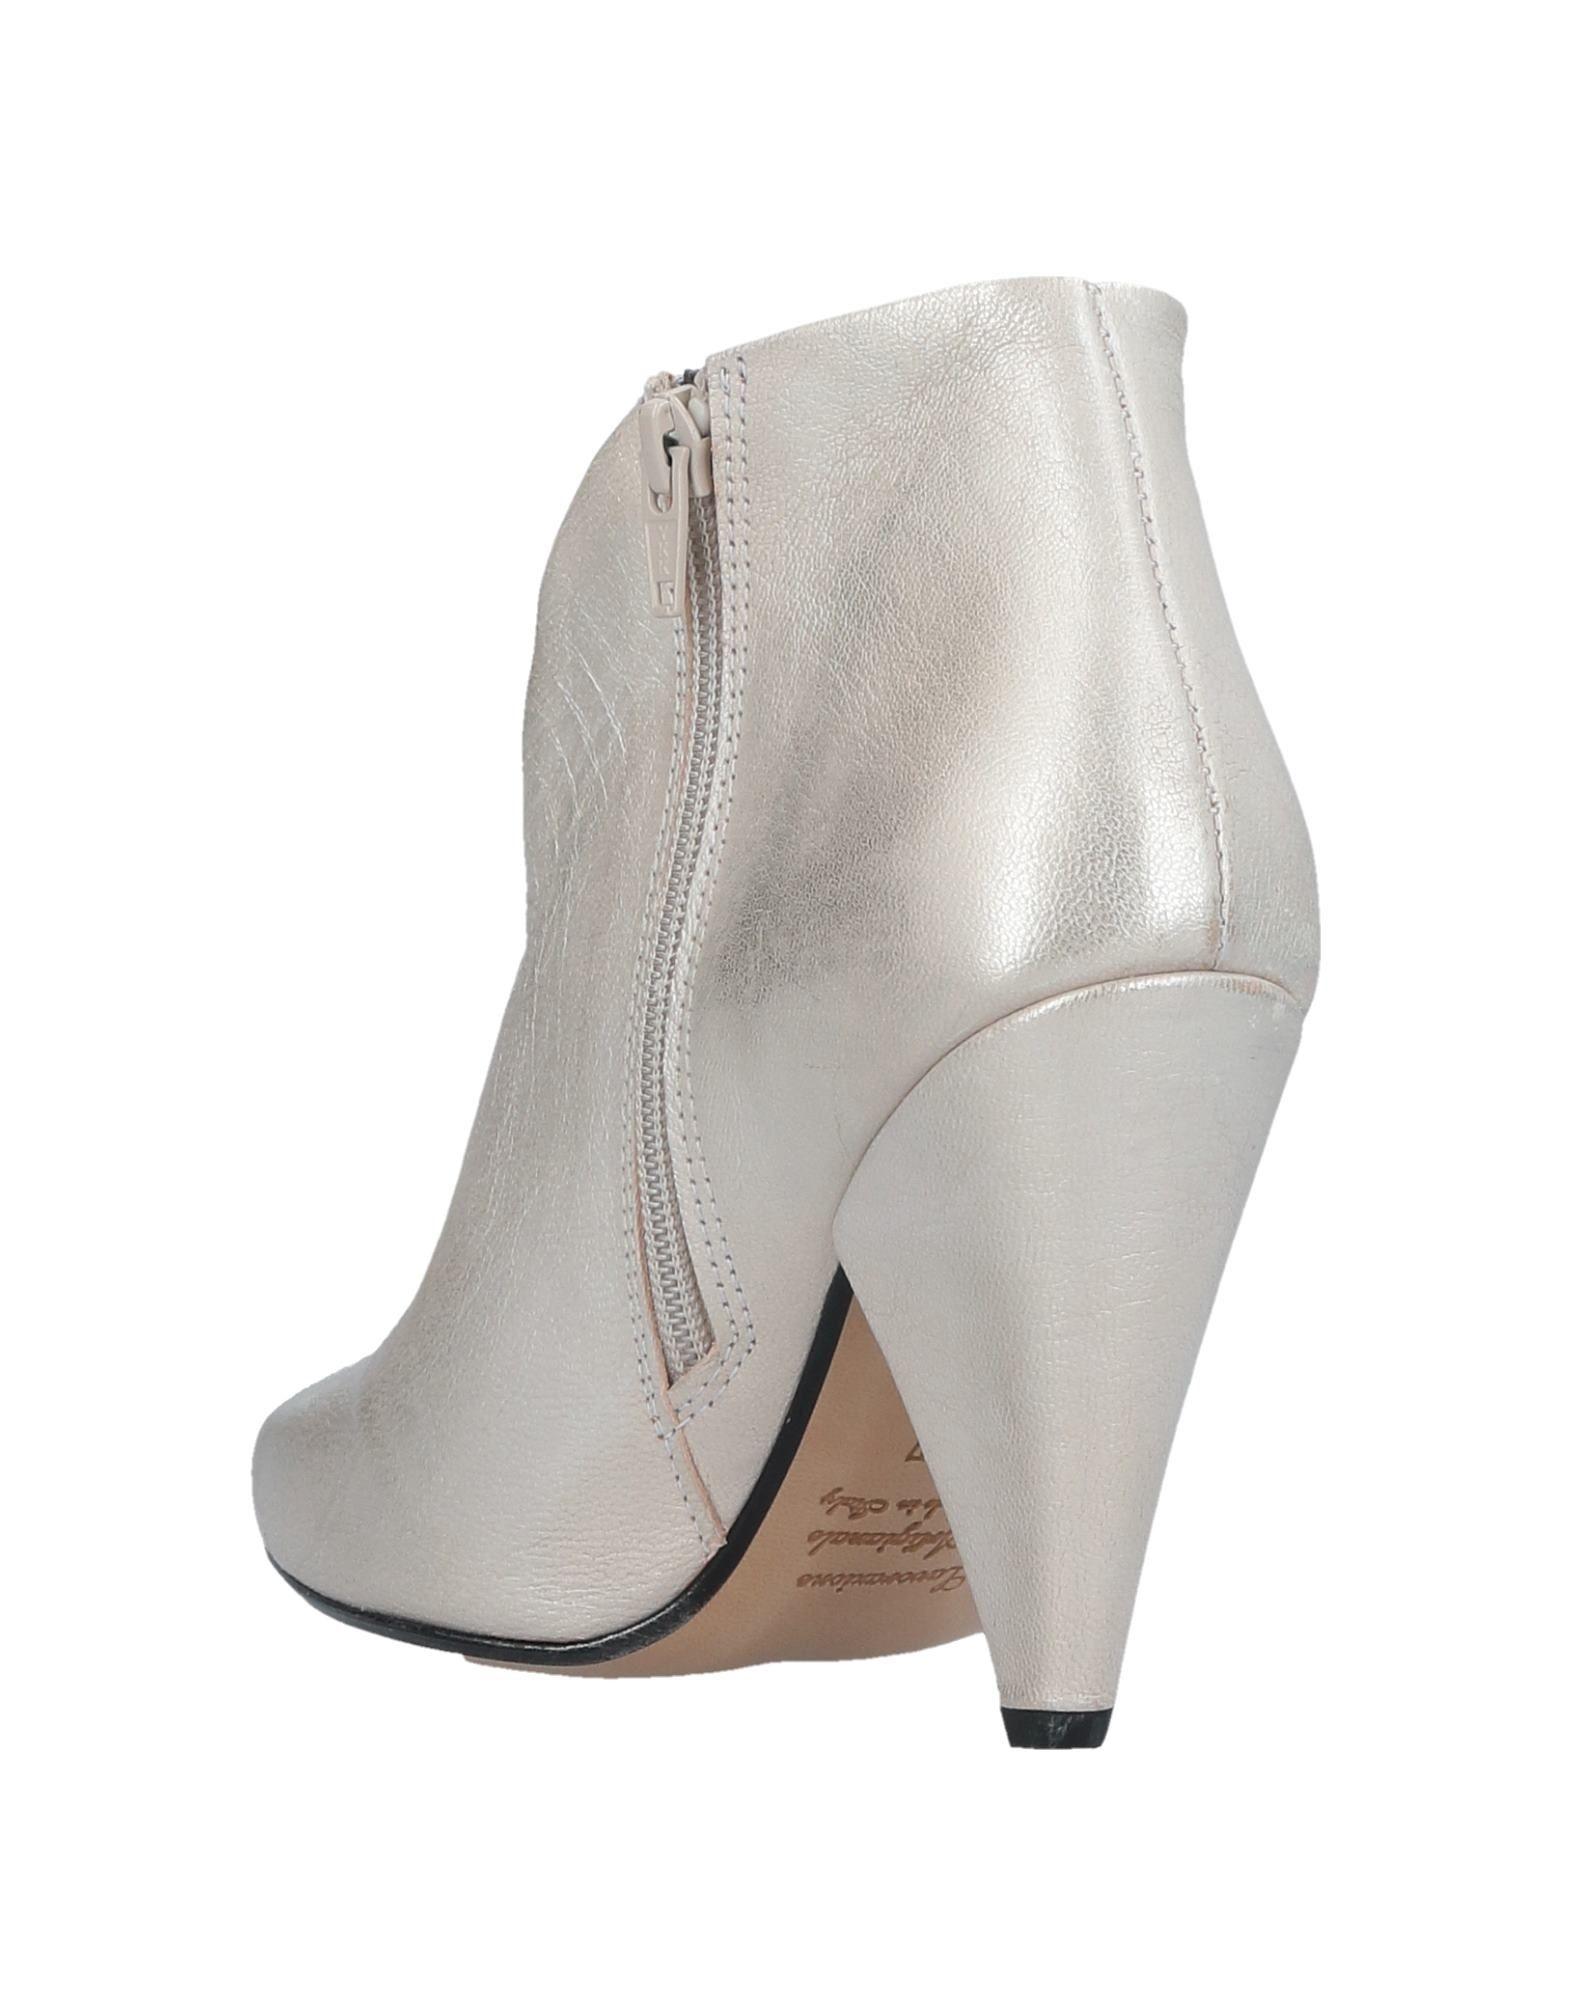 Unlace Stiefelette Damen  11528731GN Schuhe Gute Qualität beliebte Schuhe 11528731GN df3911